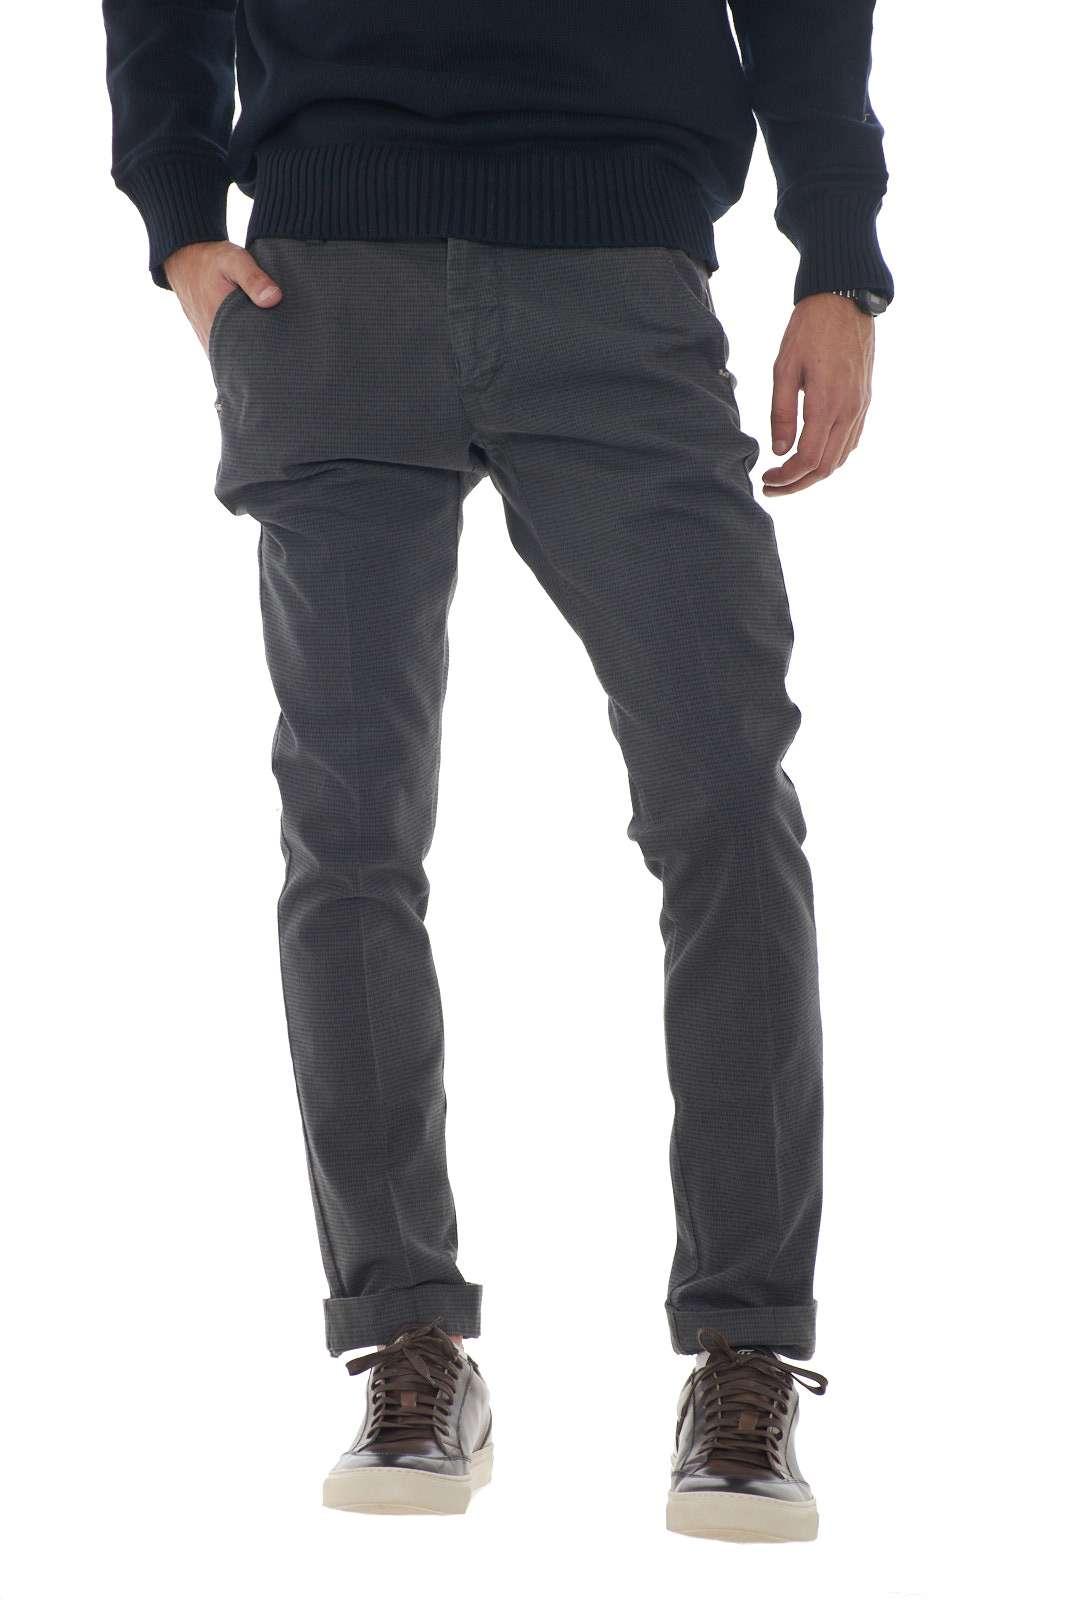 https://www.parmax.com/media/catalog/product/a/i/AI-outlet_parmax-pantaloni-uomo-Entre-Amis-A208358%201788-A.jpg